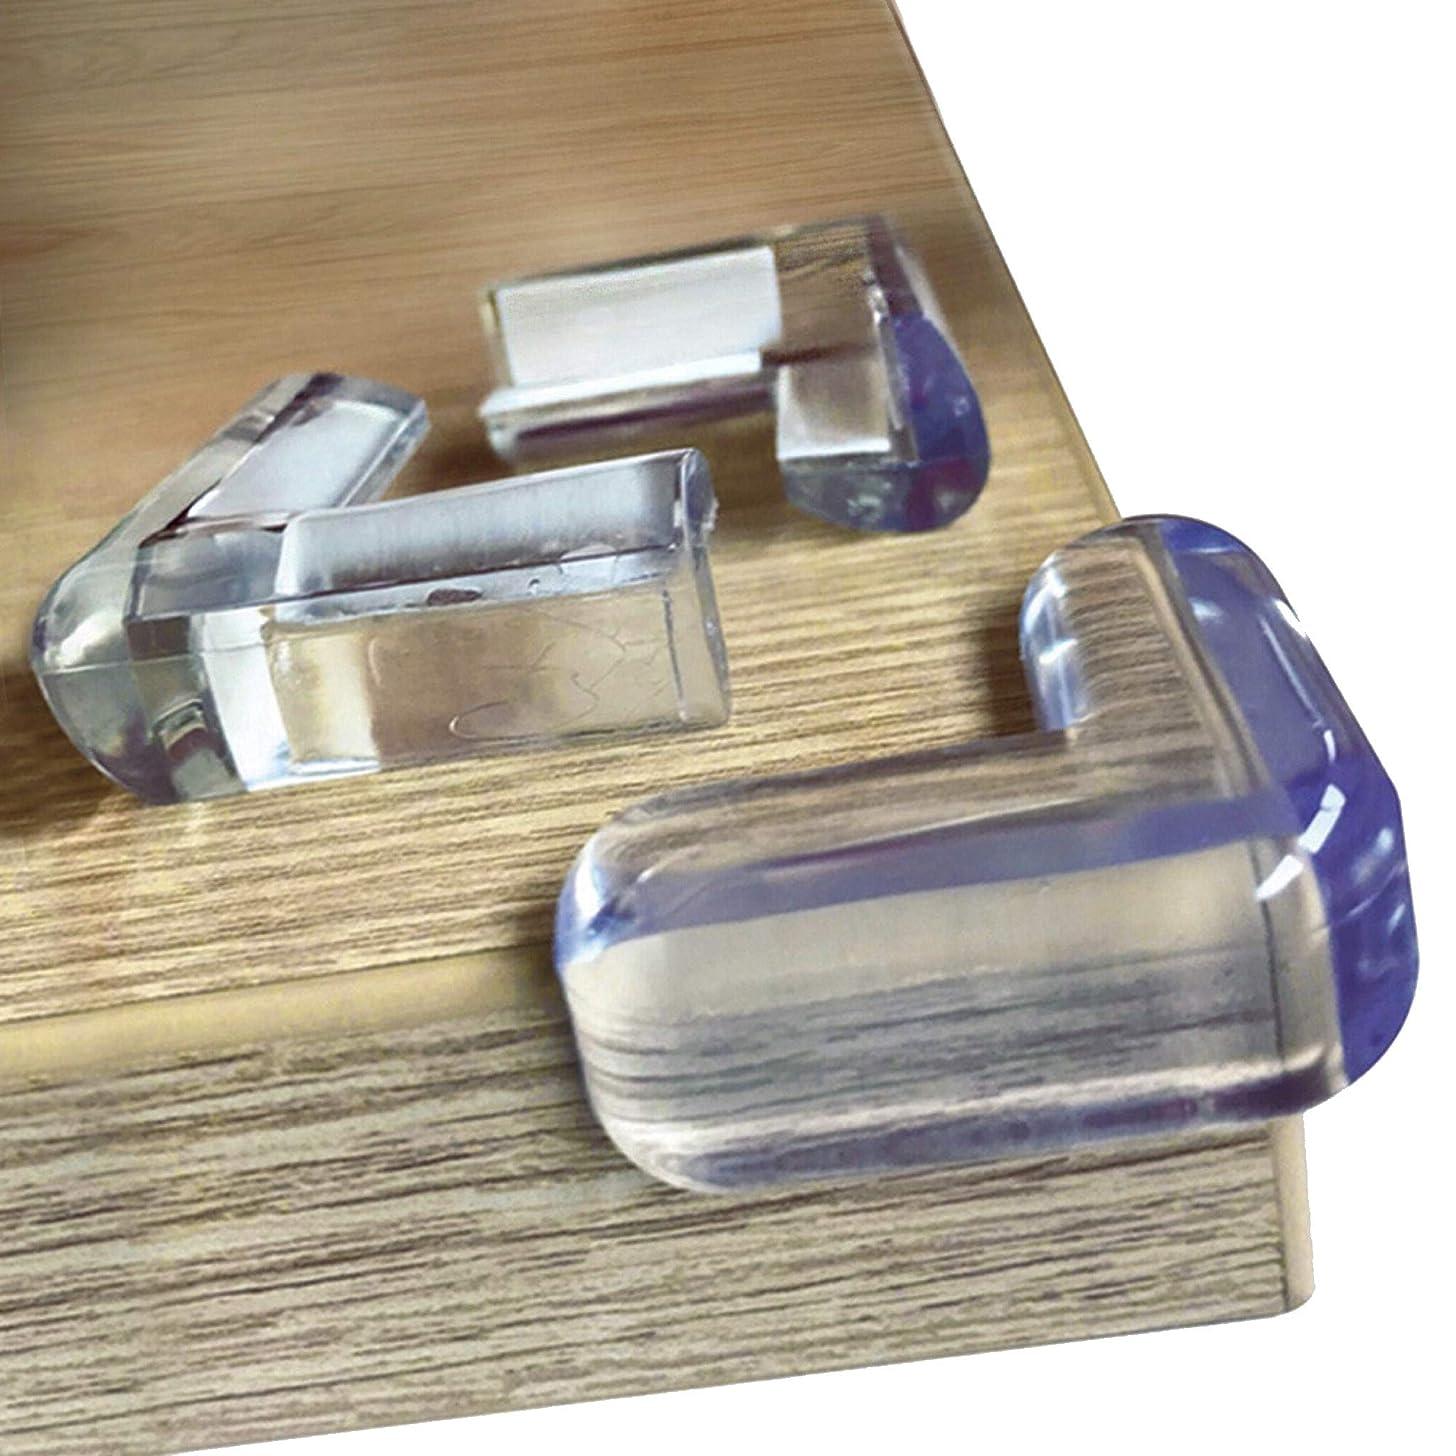 Skyla Homes - Clear Corner Protectors (20-Pack) | High Resistant Adhesive Gel | Best Baby Proof Corner Guards | Stop Child Head Injuries | Tables, Furniture & Sharp Corners Baby Proofing